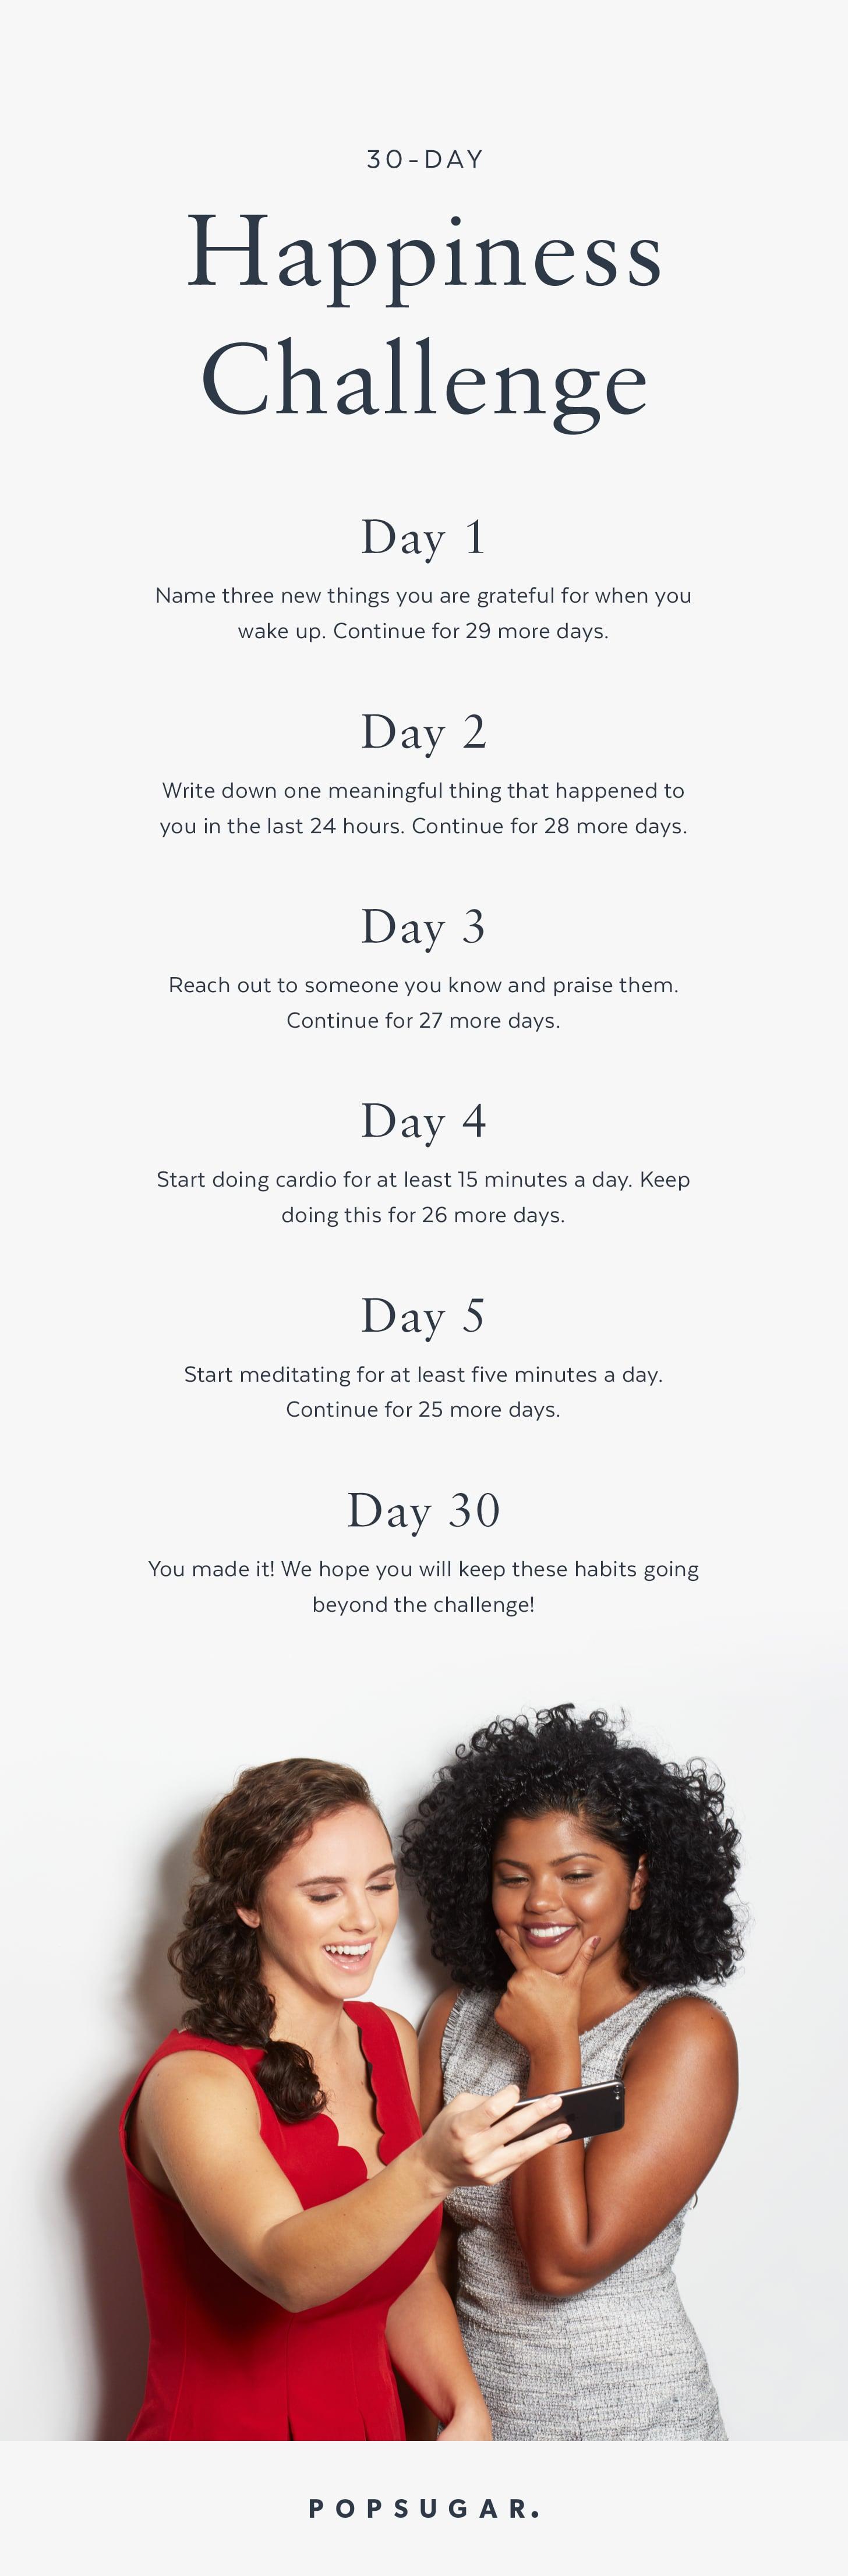 30-Day Happiness Challenge | POPSUGAR Smart Living